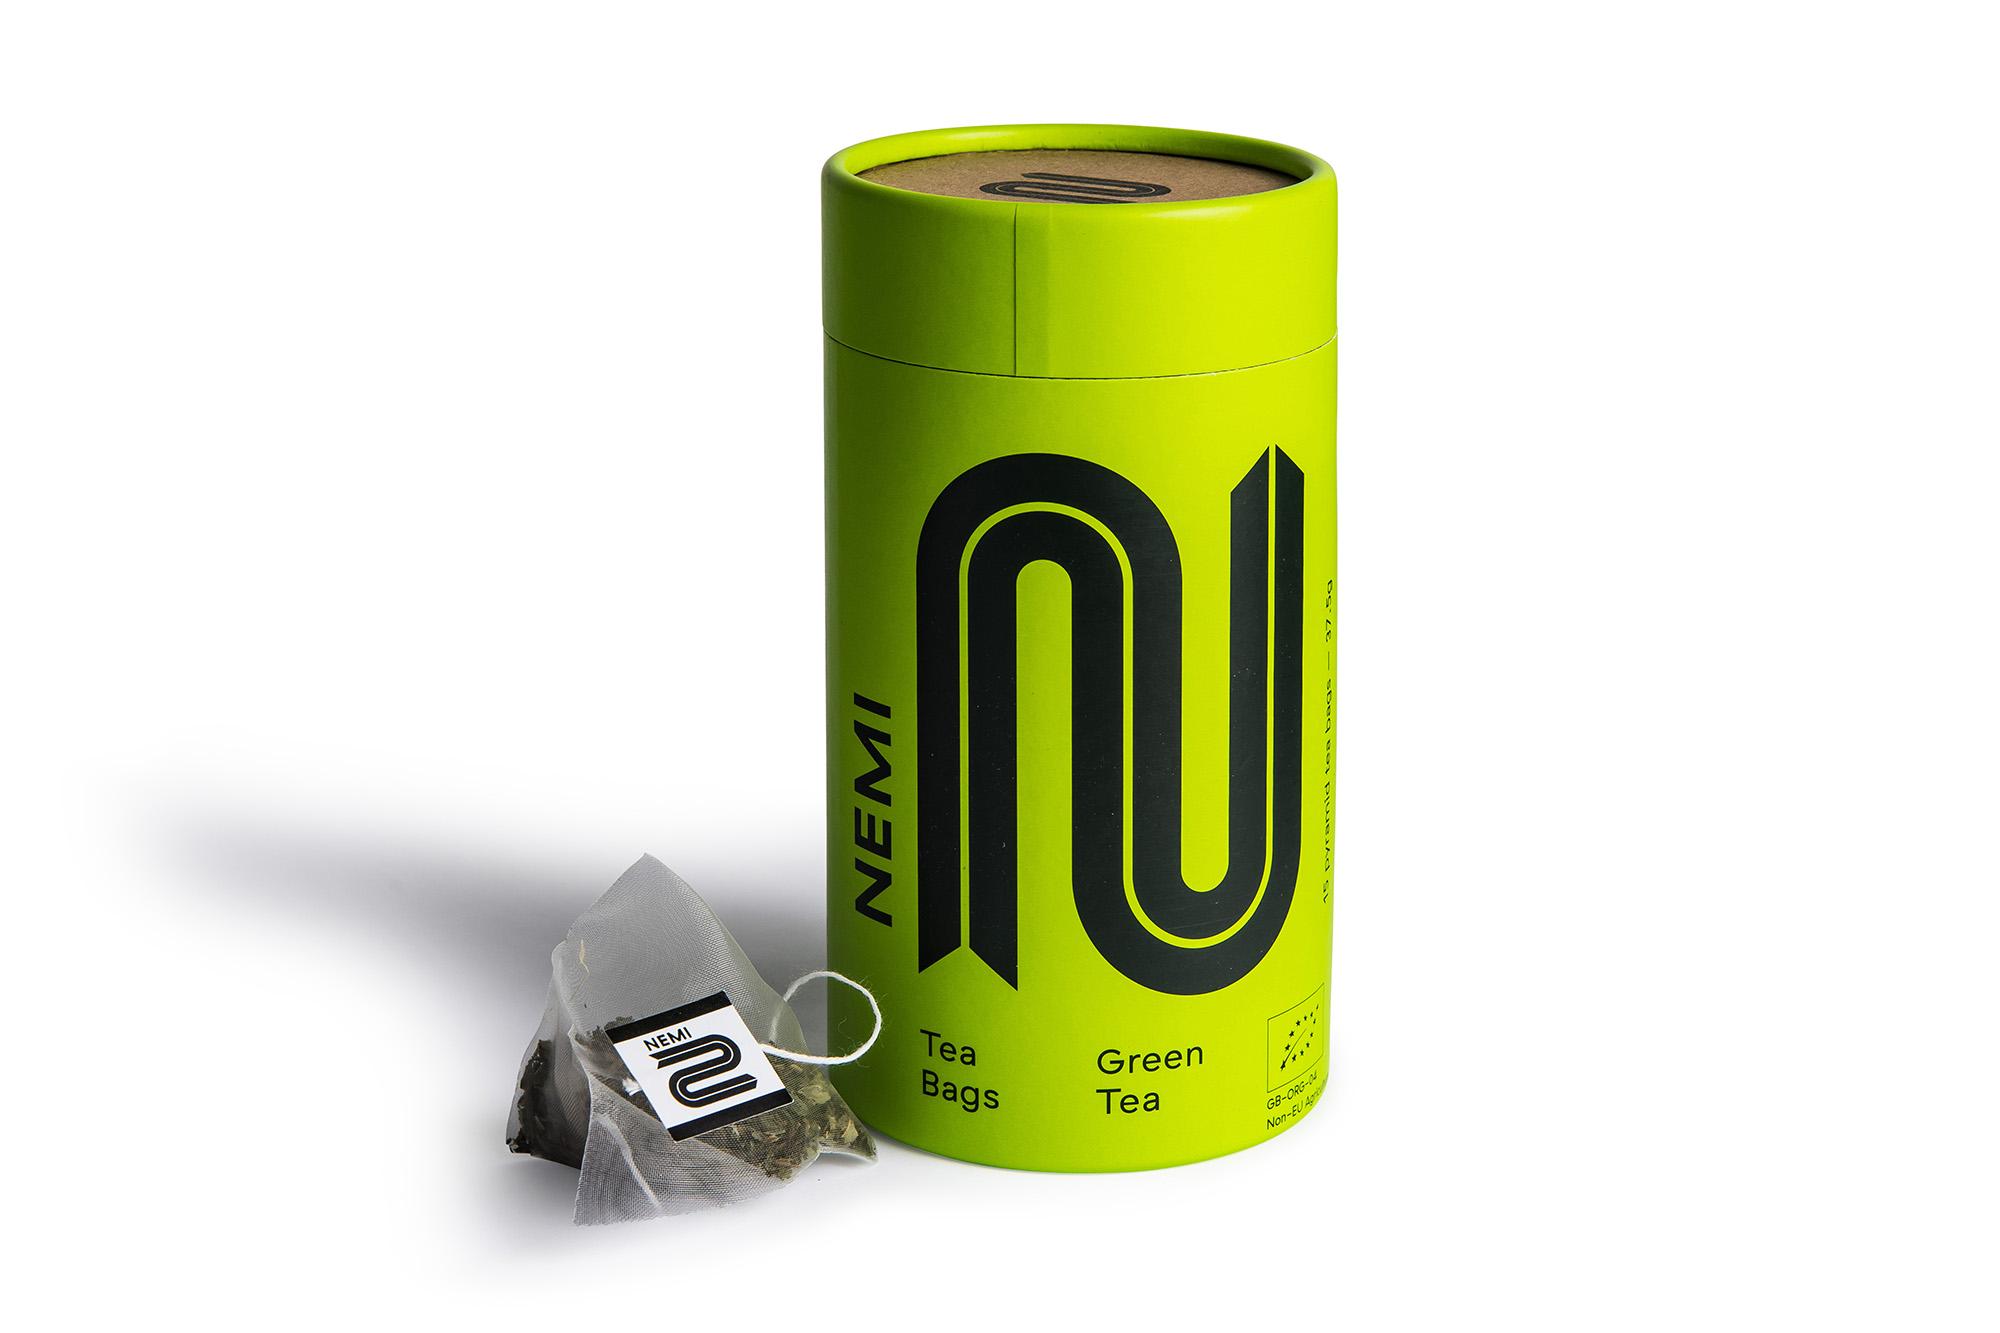 chris perfect image product green tea